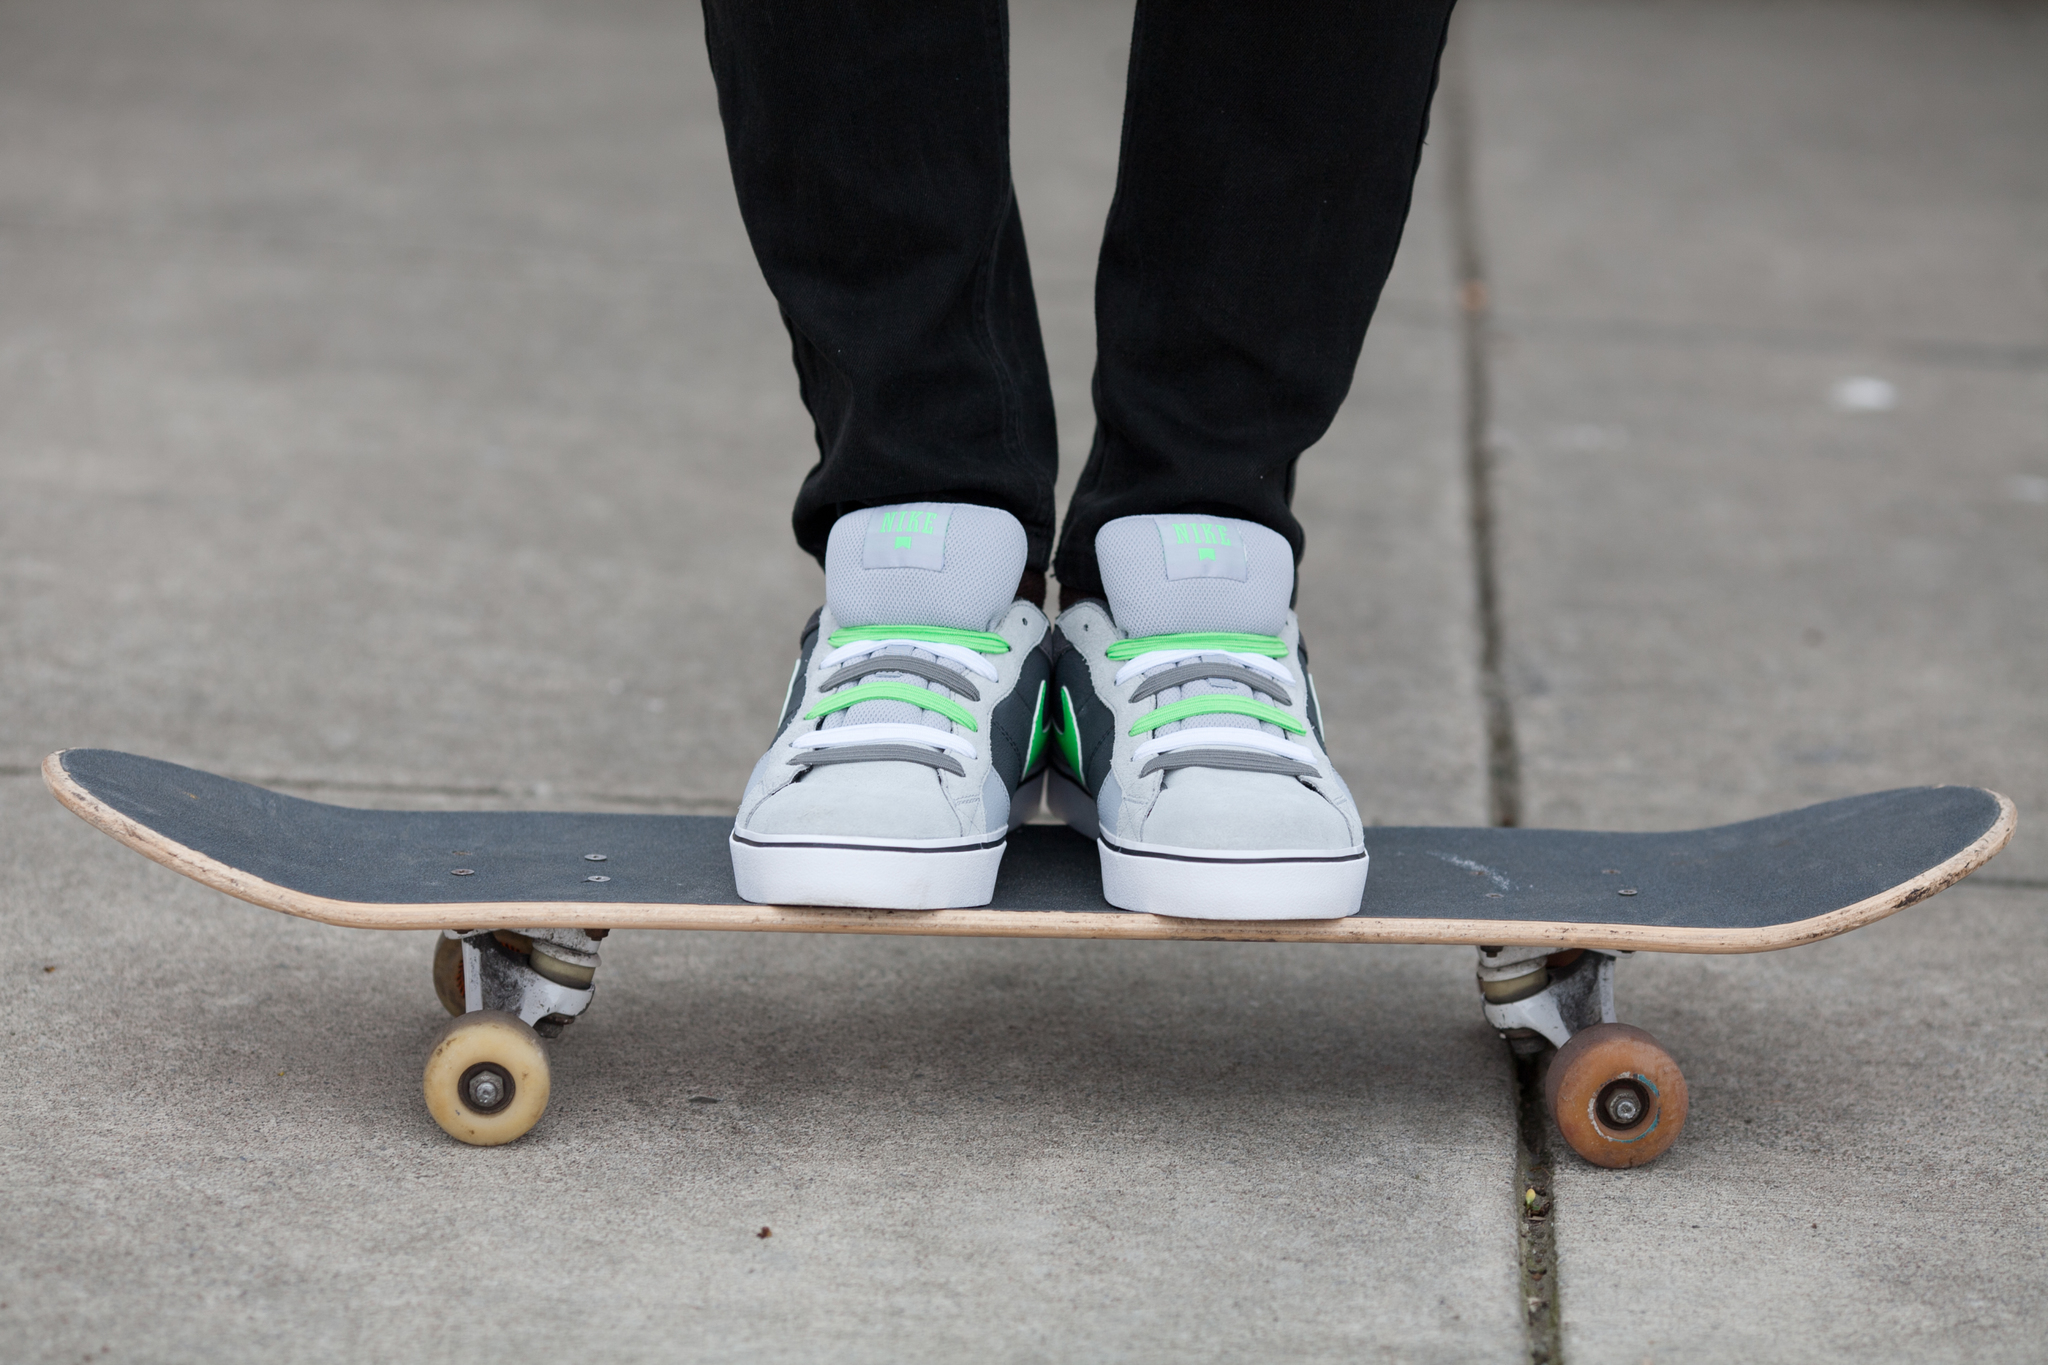 Grey shoes on skateboard